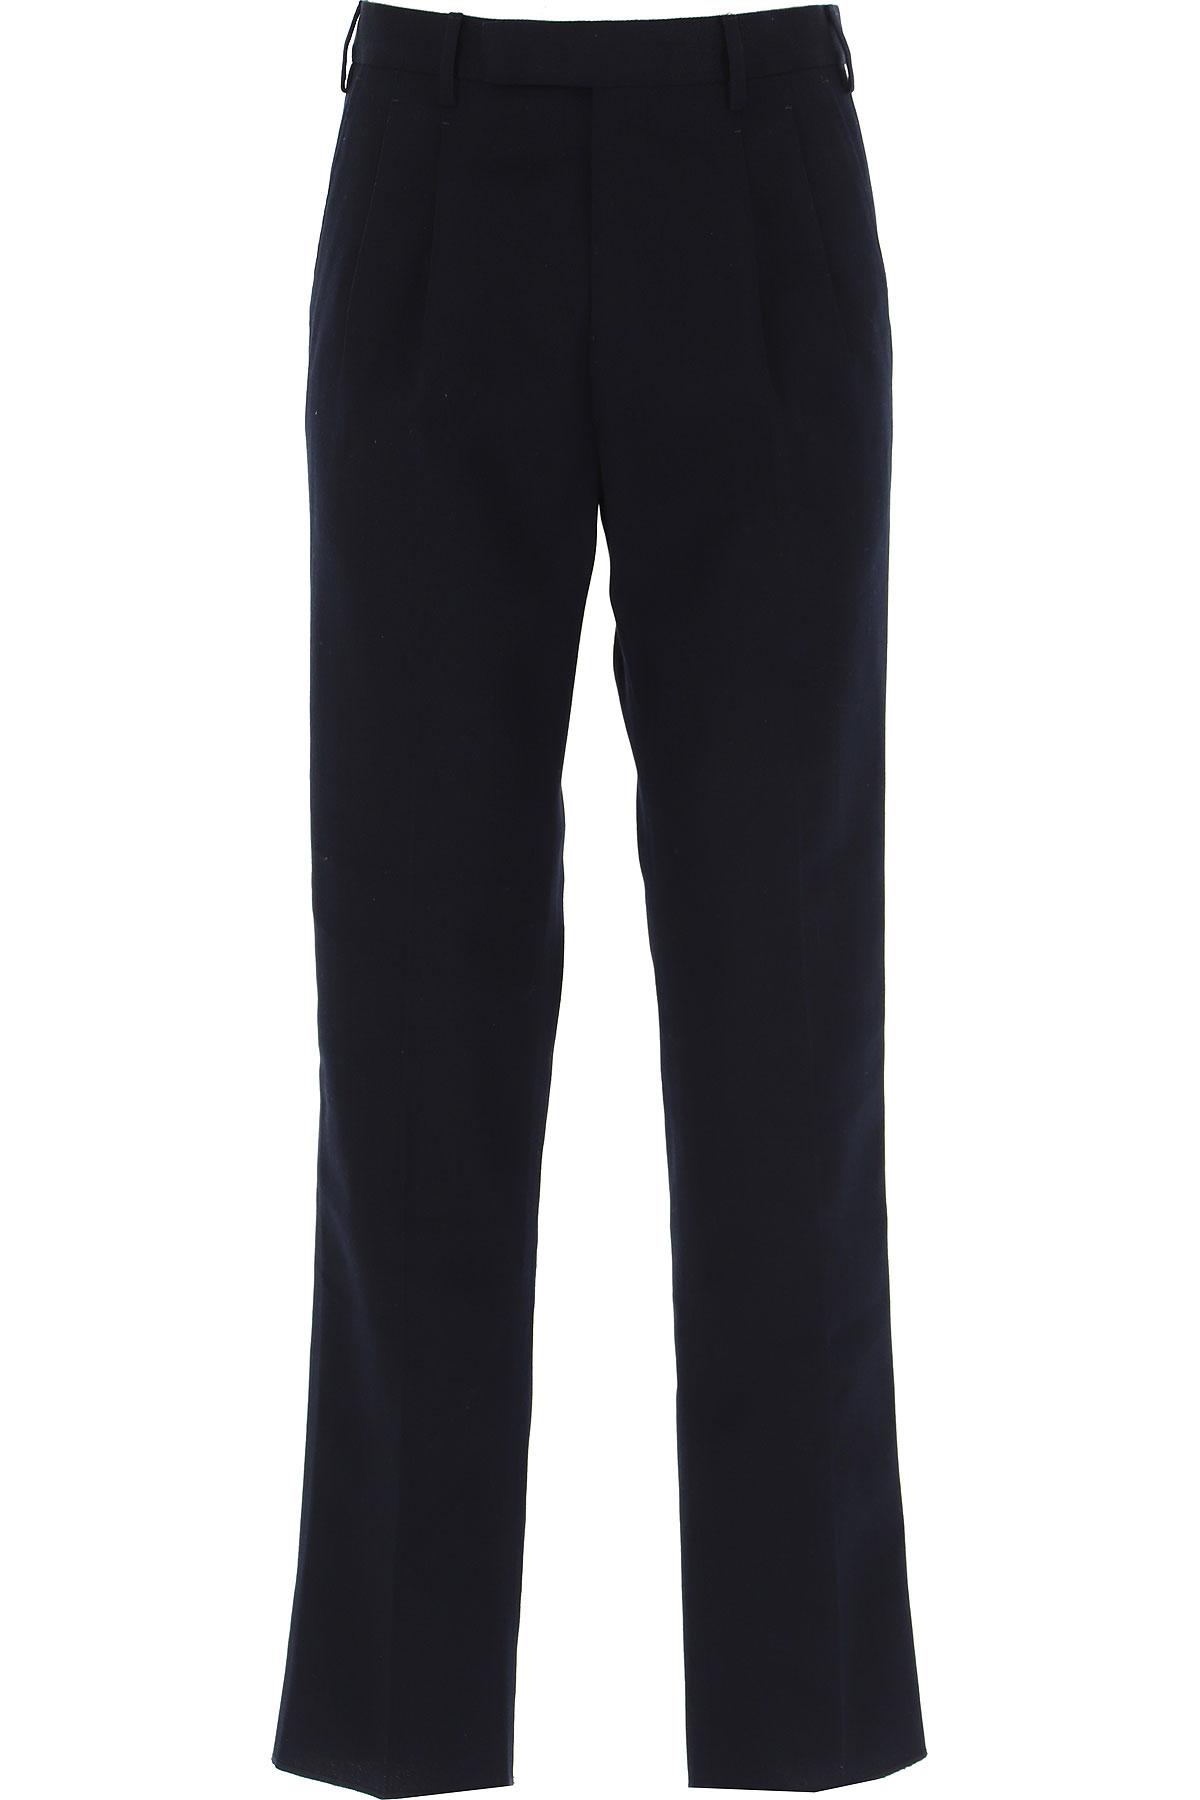 Ermenegildo Zegna Pants For Men, Black, Cotton, 2021, 32 34 36